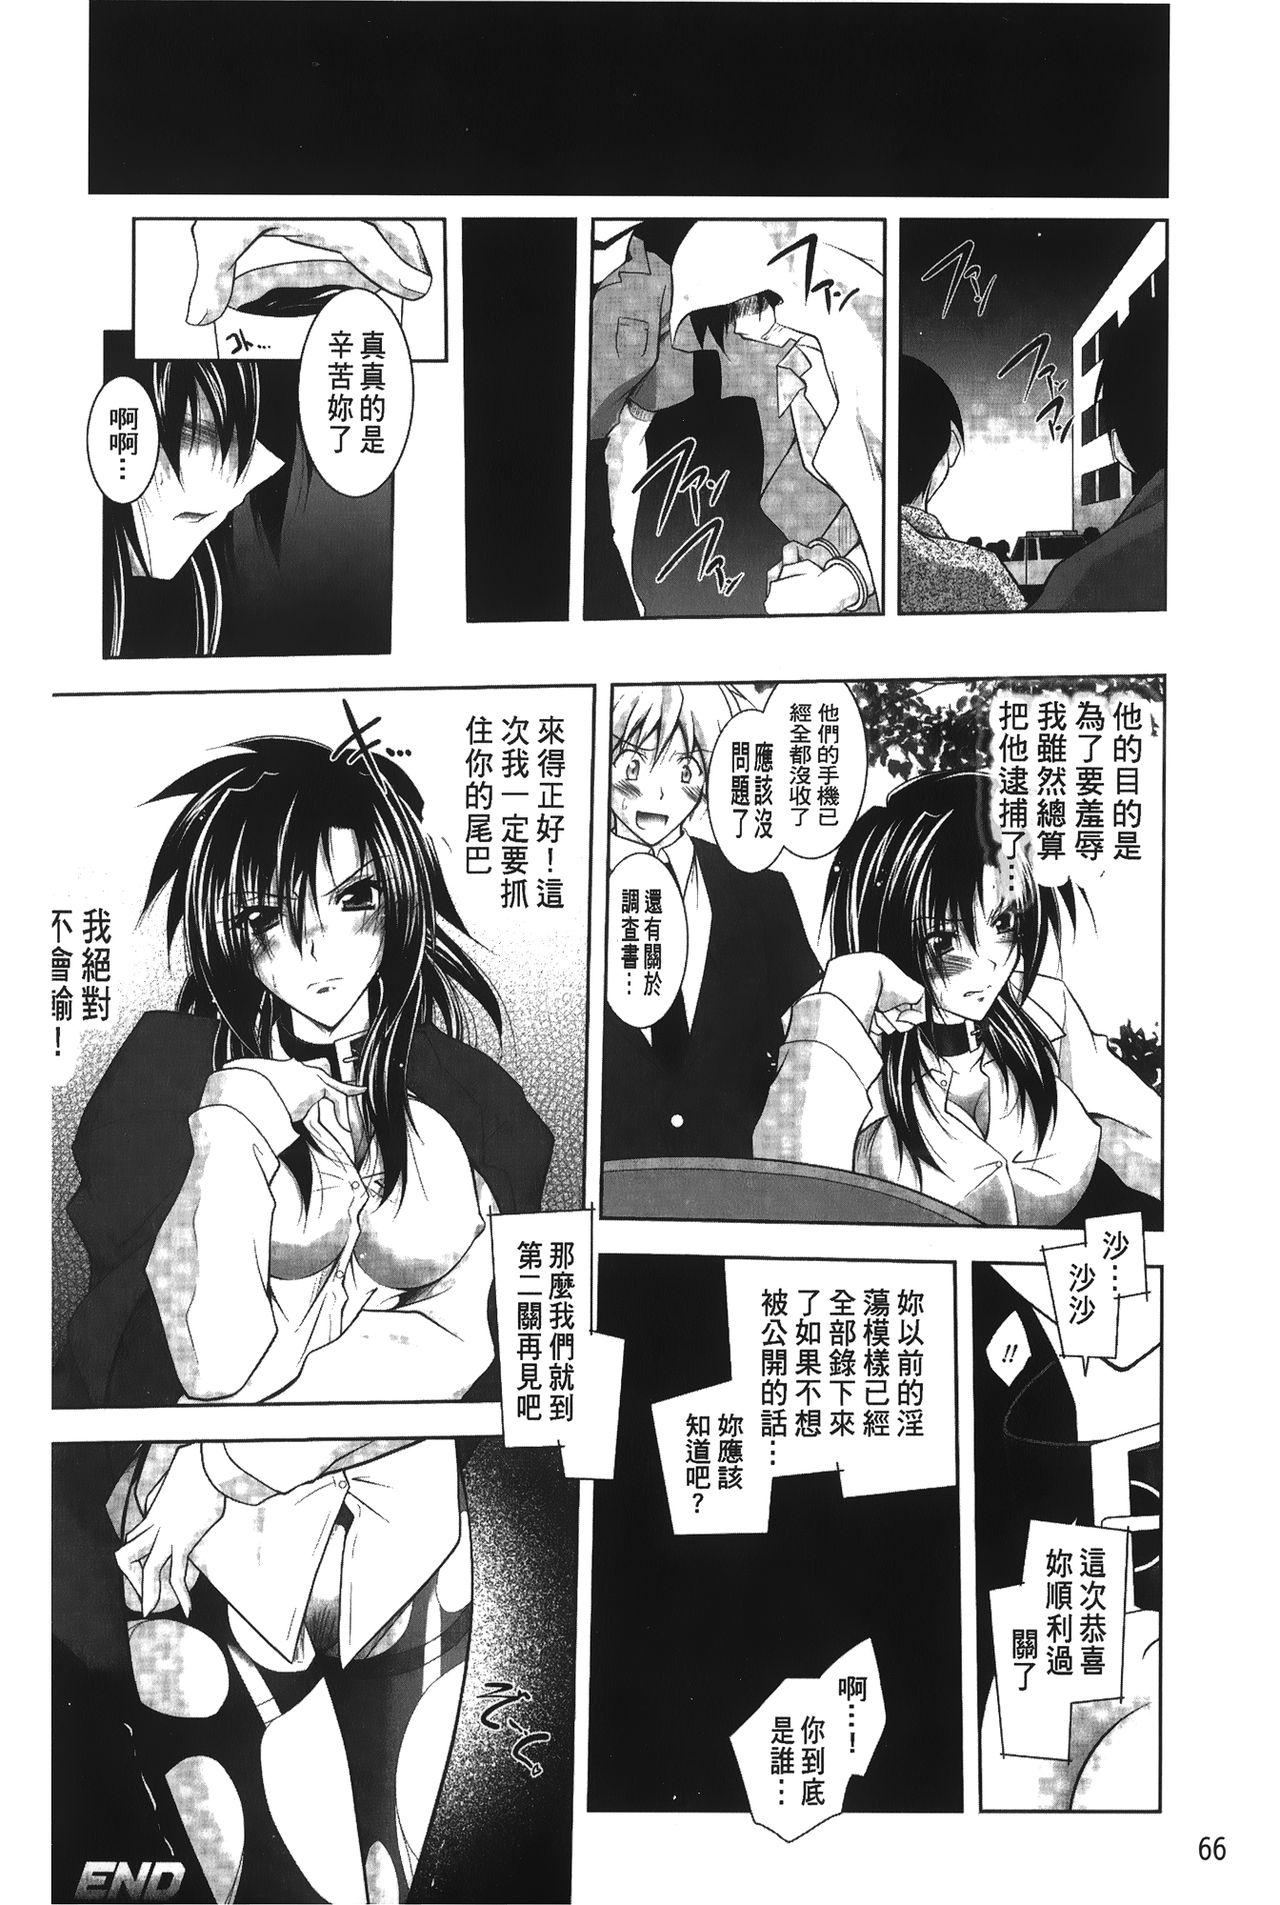 [Parfait] Datenshi-tachi no Rondo - Fallen Angels Rondo   墮天使們的圓舞曲 [Chinese] 66